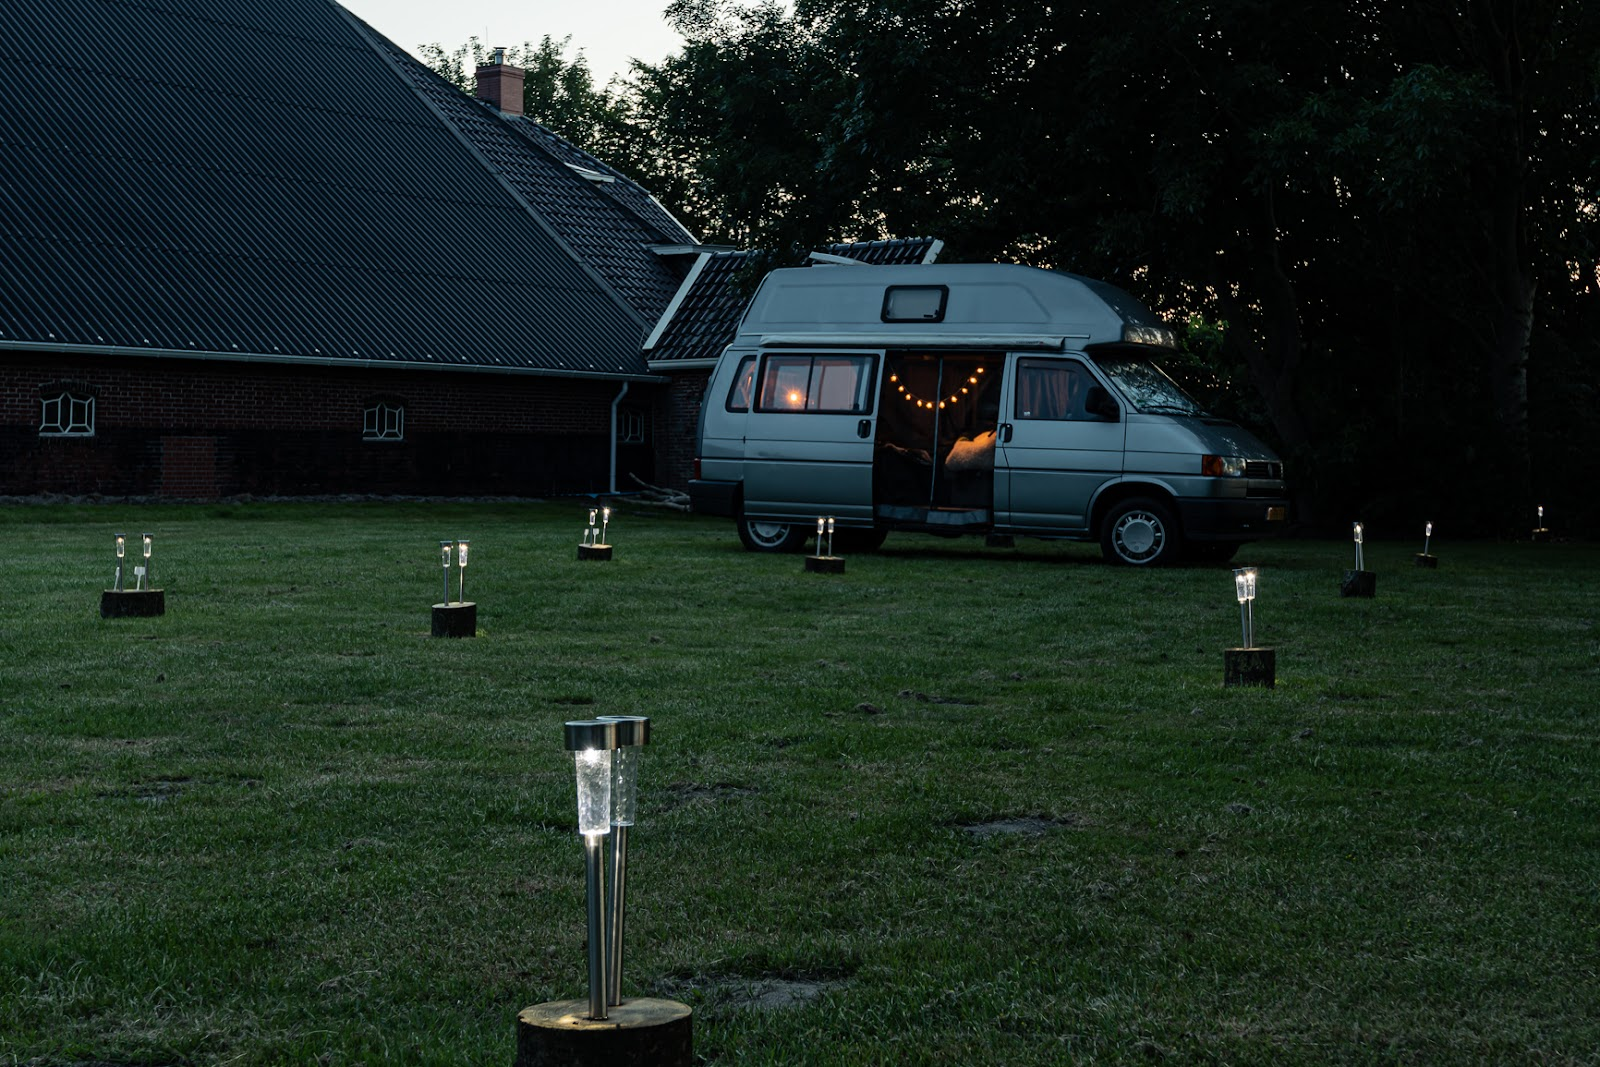 Lanterns in front camper outdoor life hacks Campspace